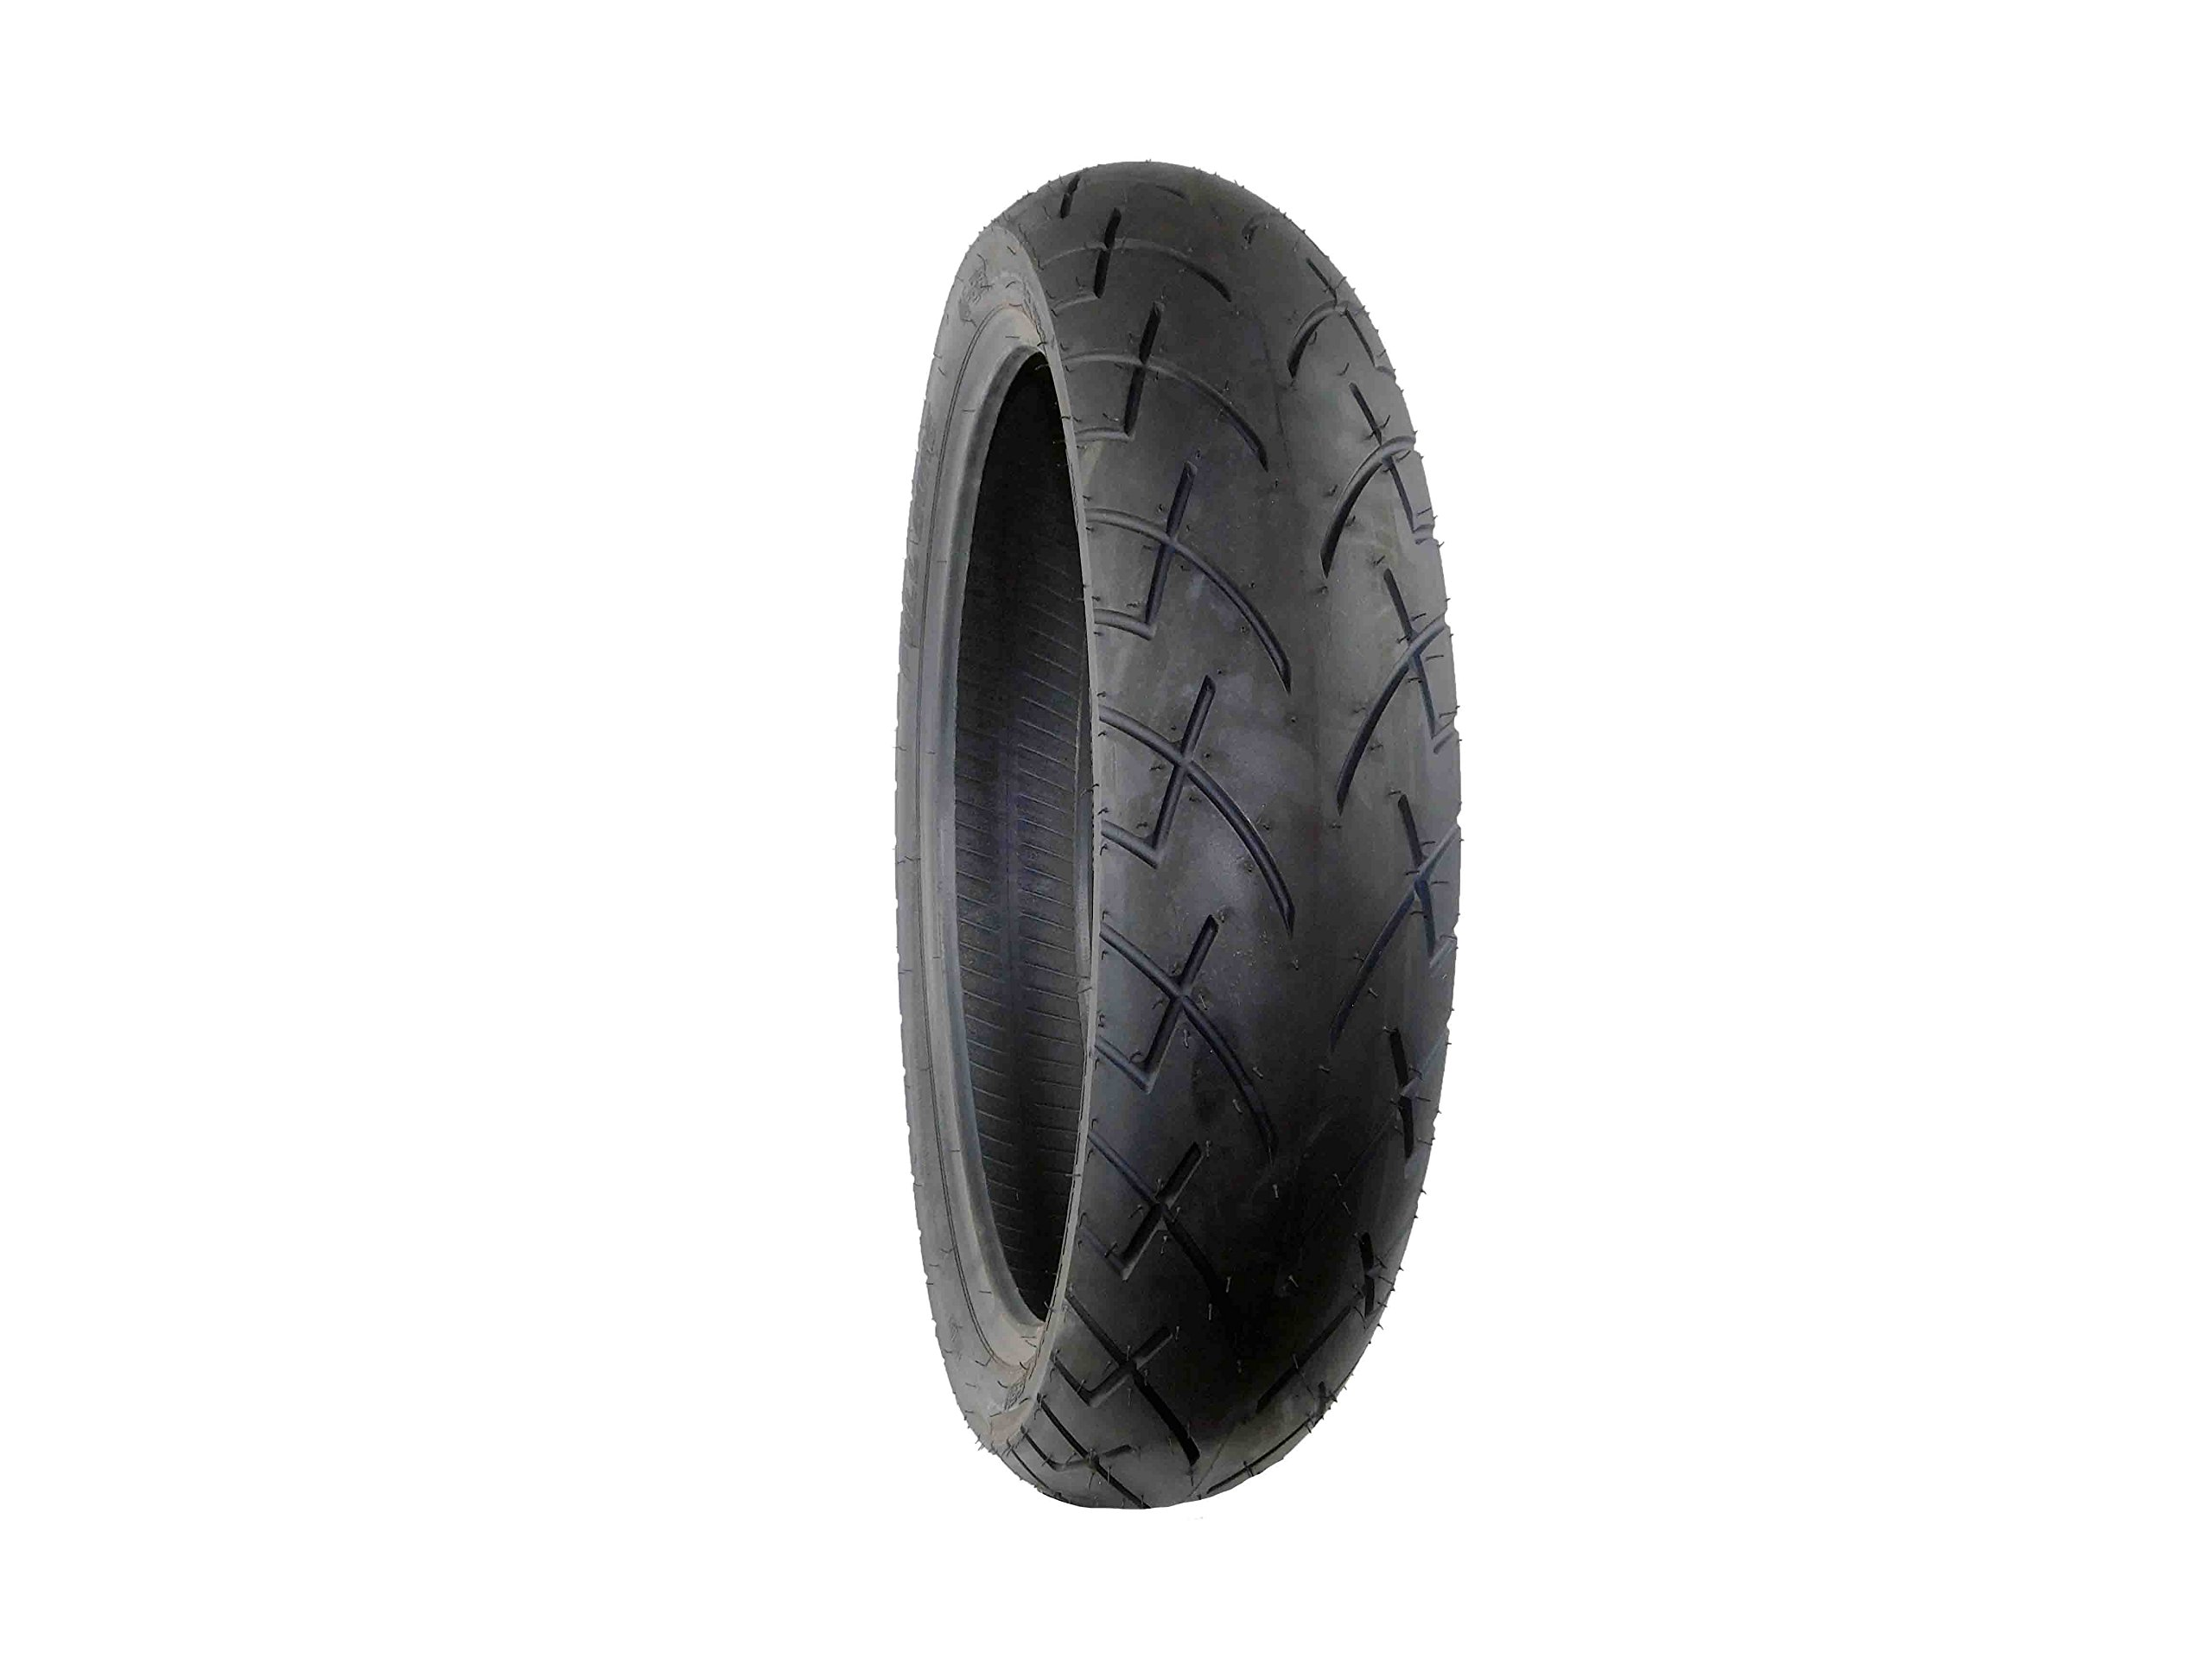 Full Bore M-66 Tour King Cruiser Motorcycle Tire (130/70B18)